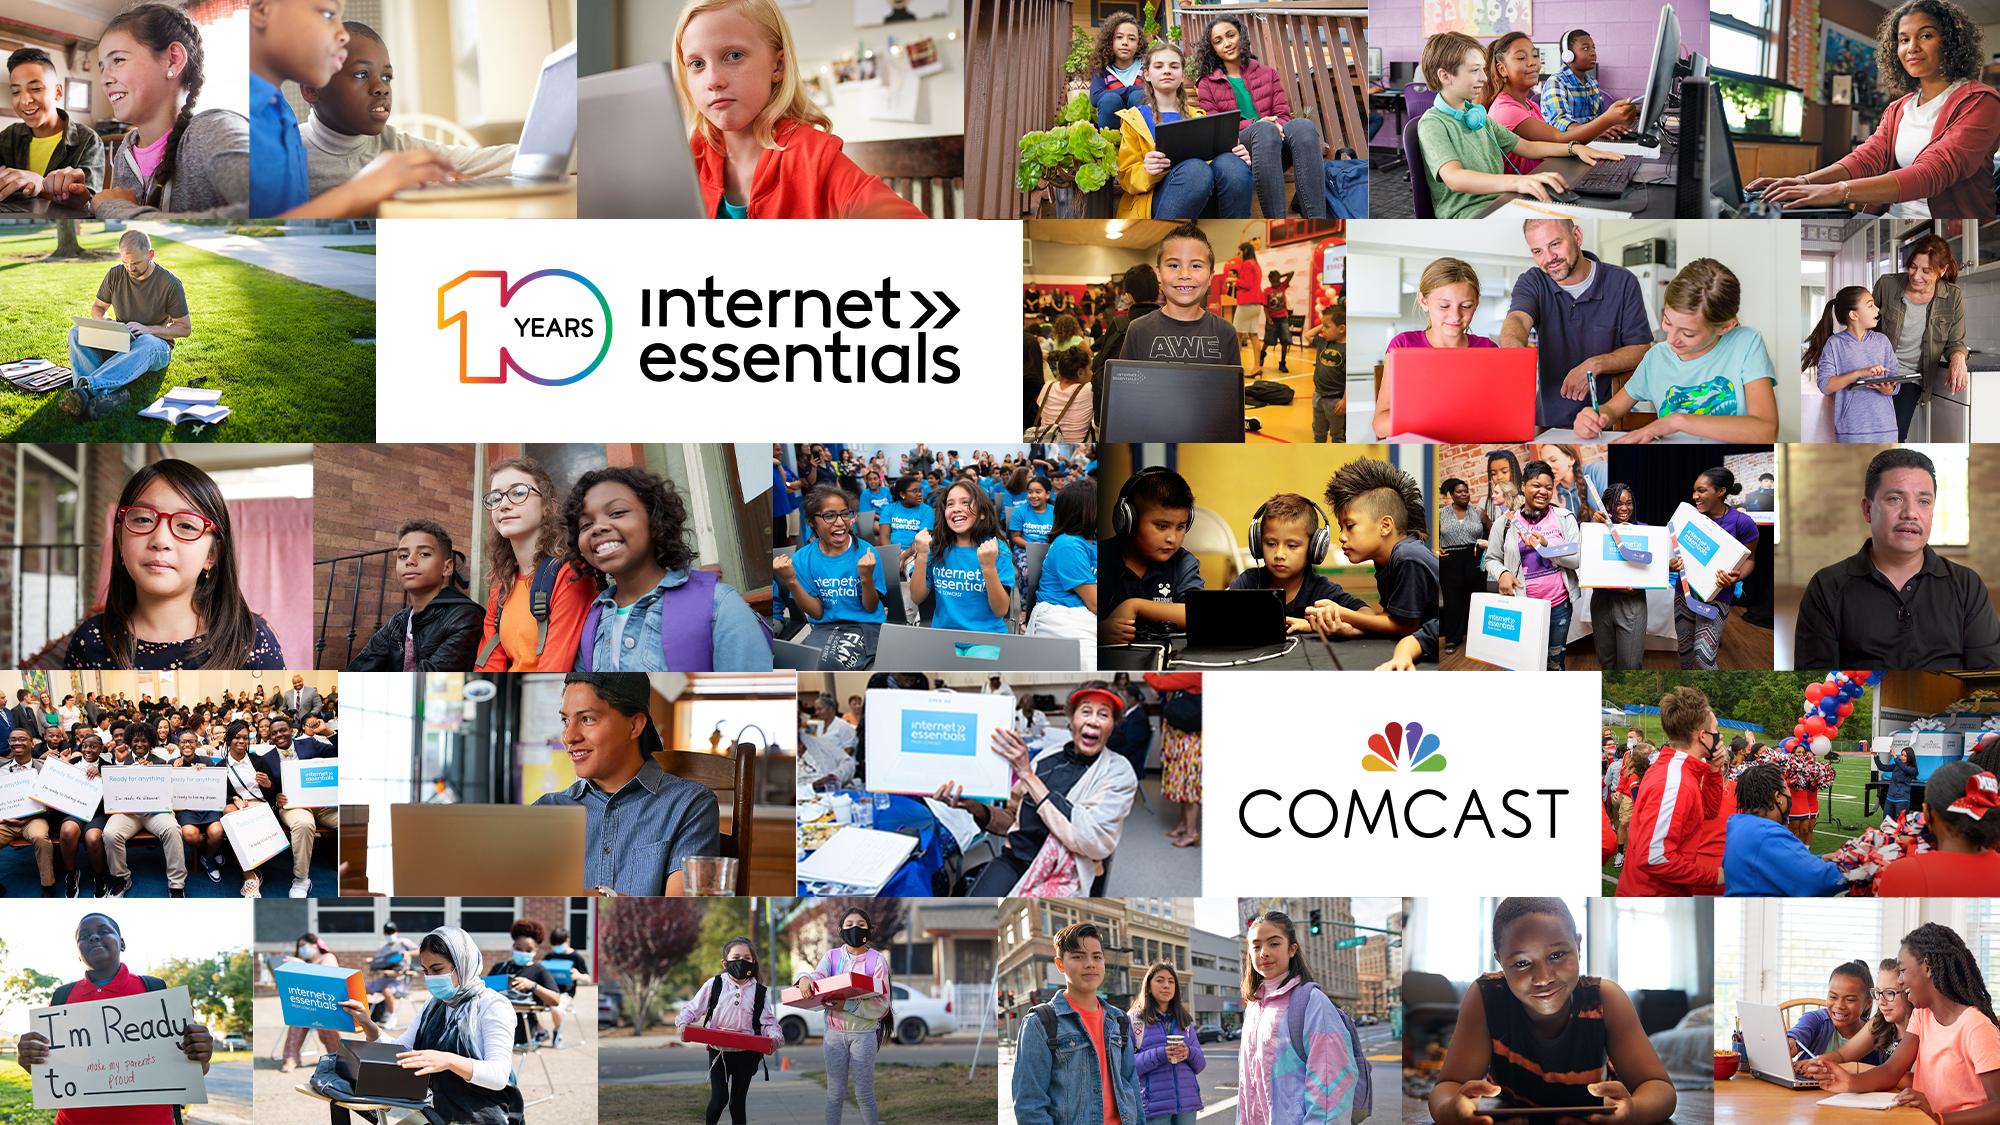 Comcast celebrates Internet Essential's 10 year anniversary.